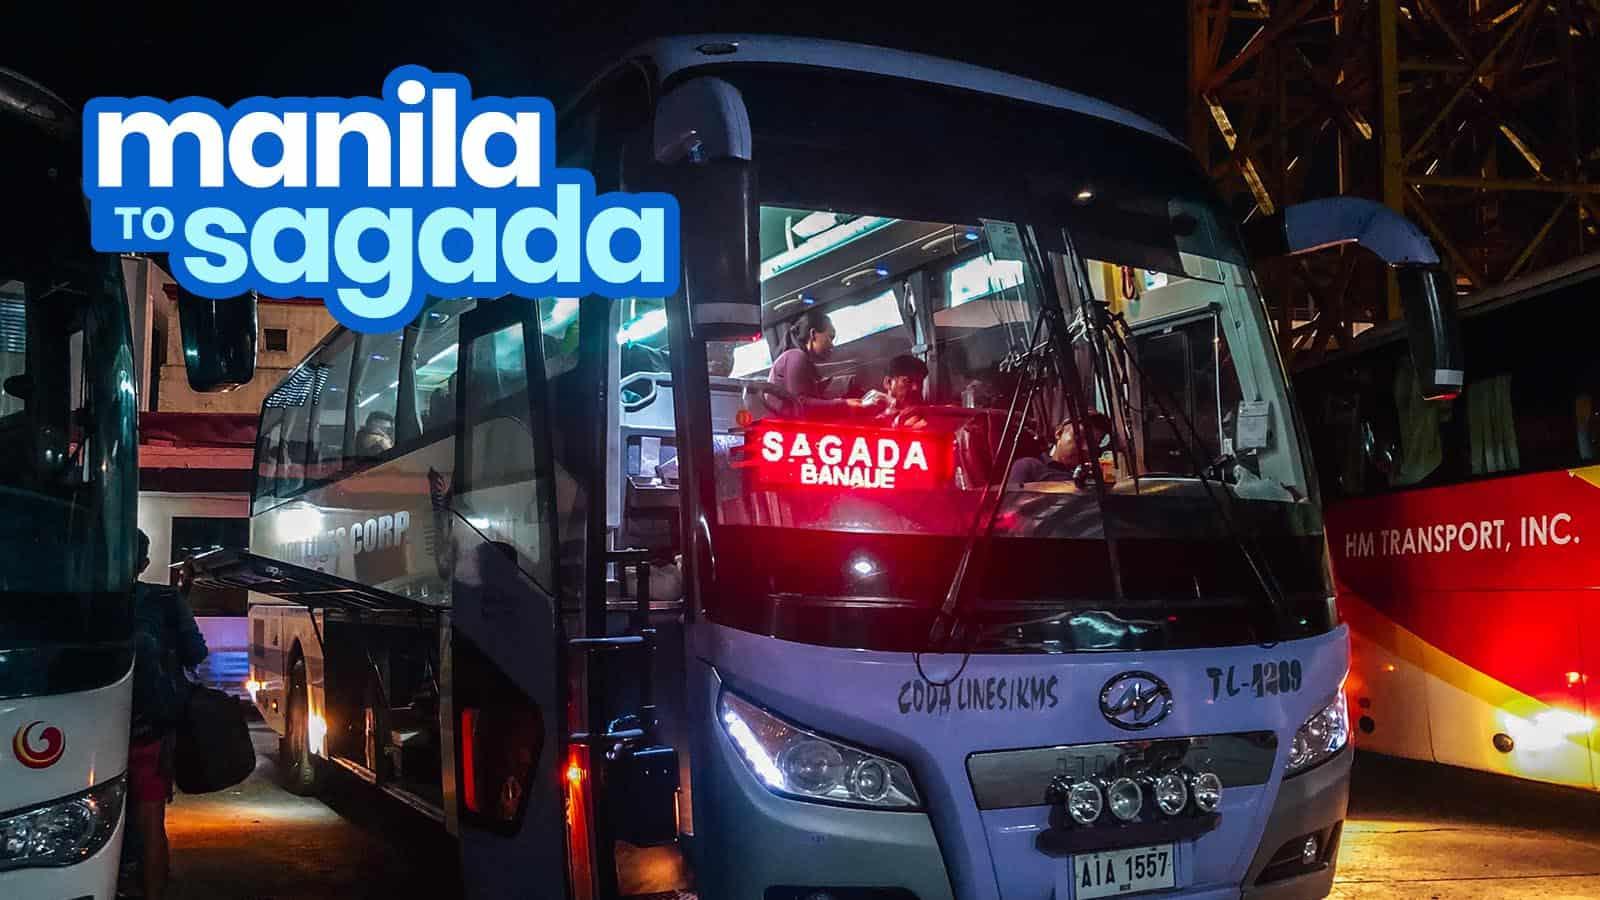 MANILA TO SAGADA: By Direct Bus (Coda Lines) & Via Baguio